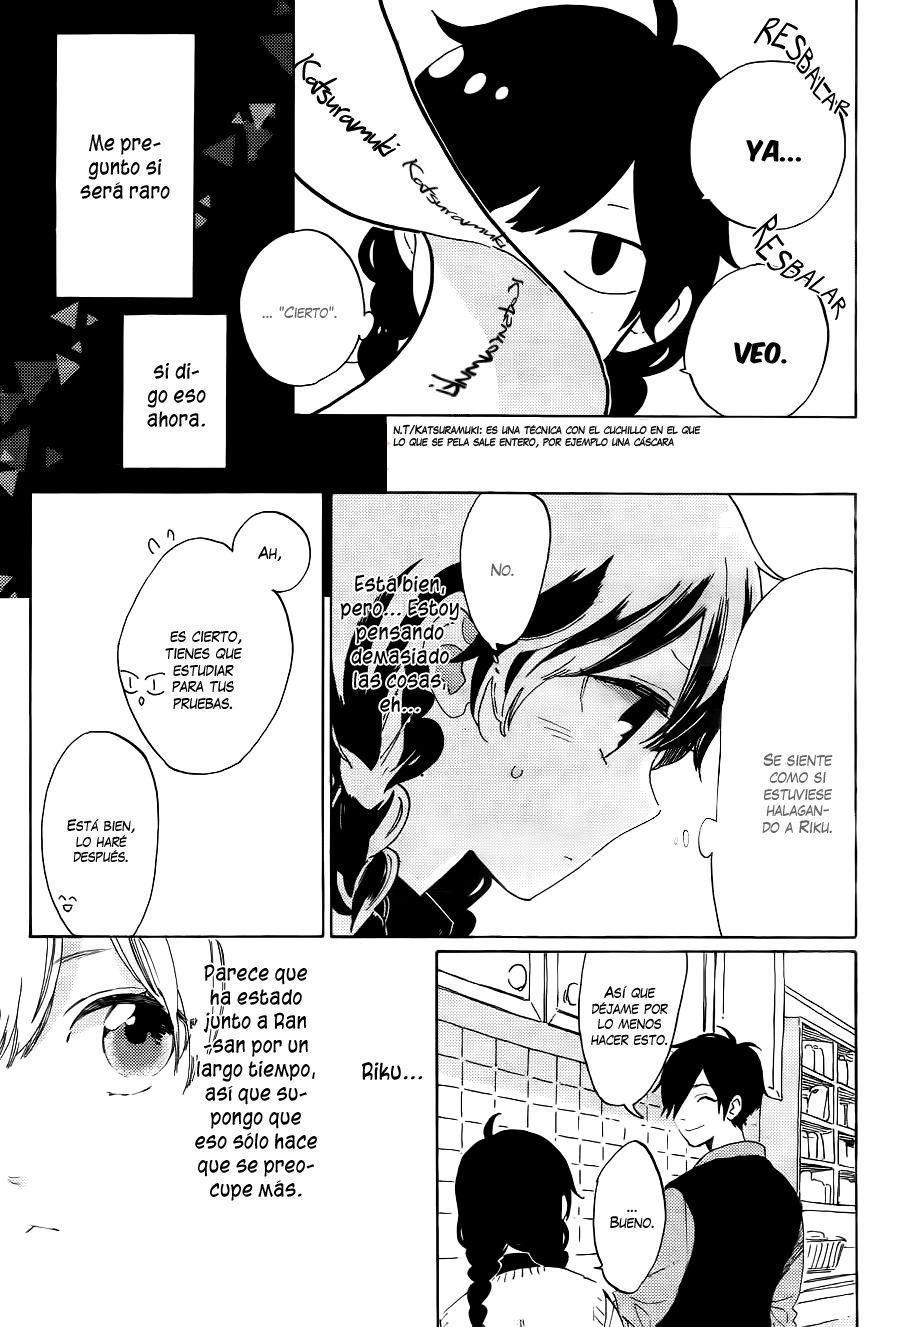 http://c5.ninemanga.com/es_manga/pic2/19/18451/488291/390f965bb0d2e8eb305468bb70750e4b.jpg Page 10